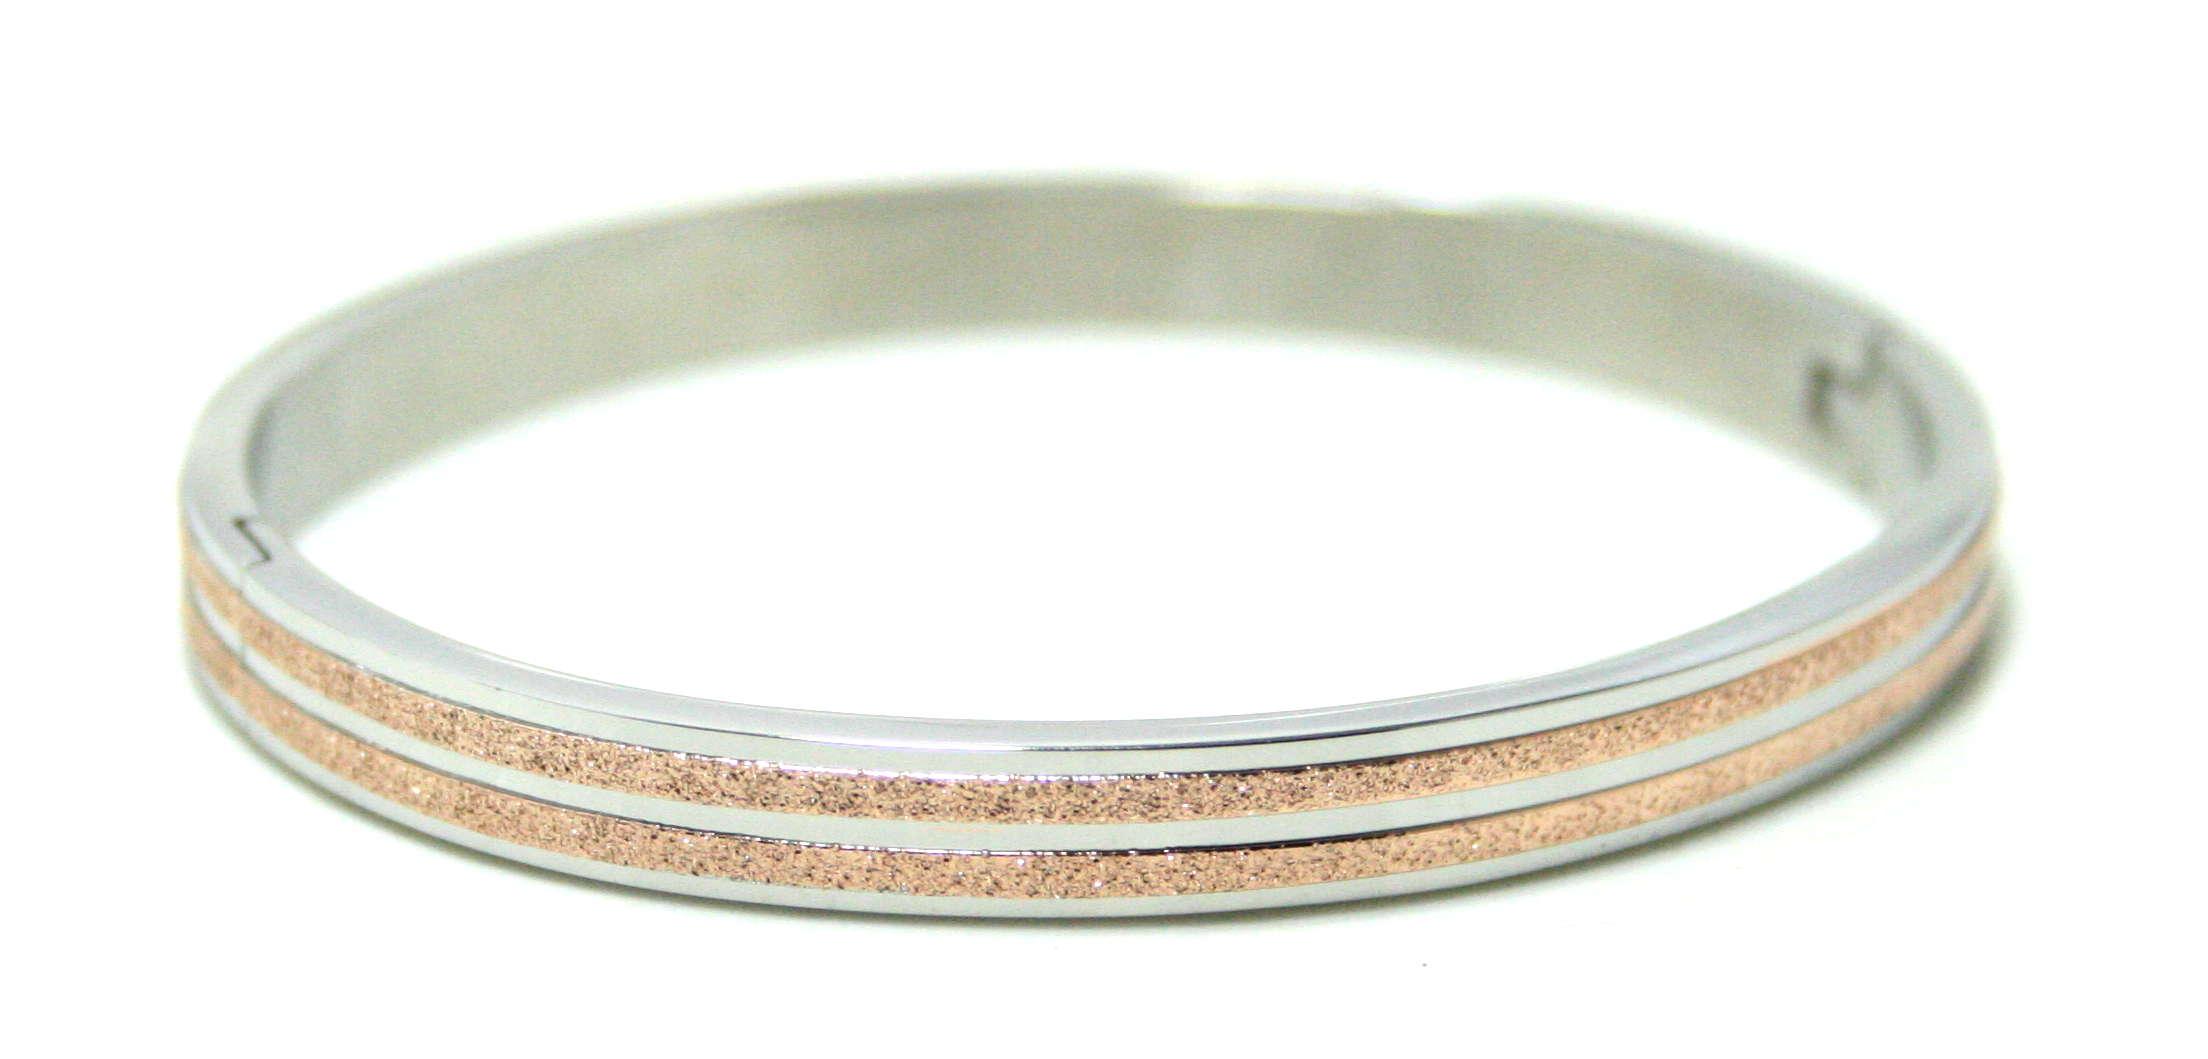 Stainless Steel bangle w rose gold sandblasting, silver